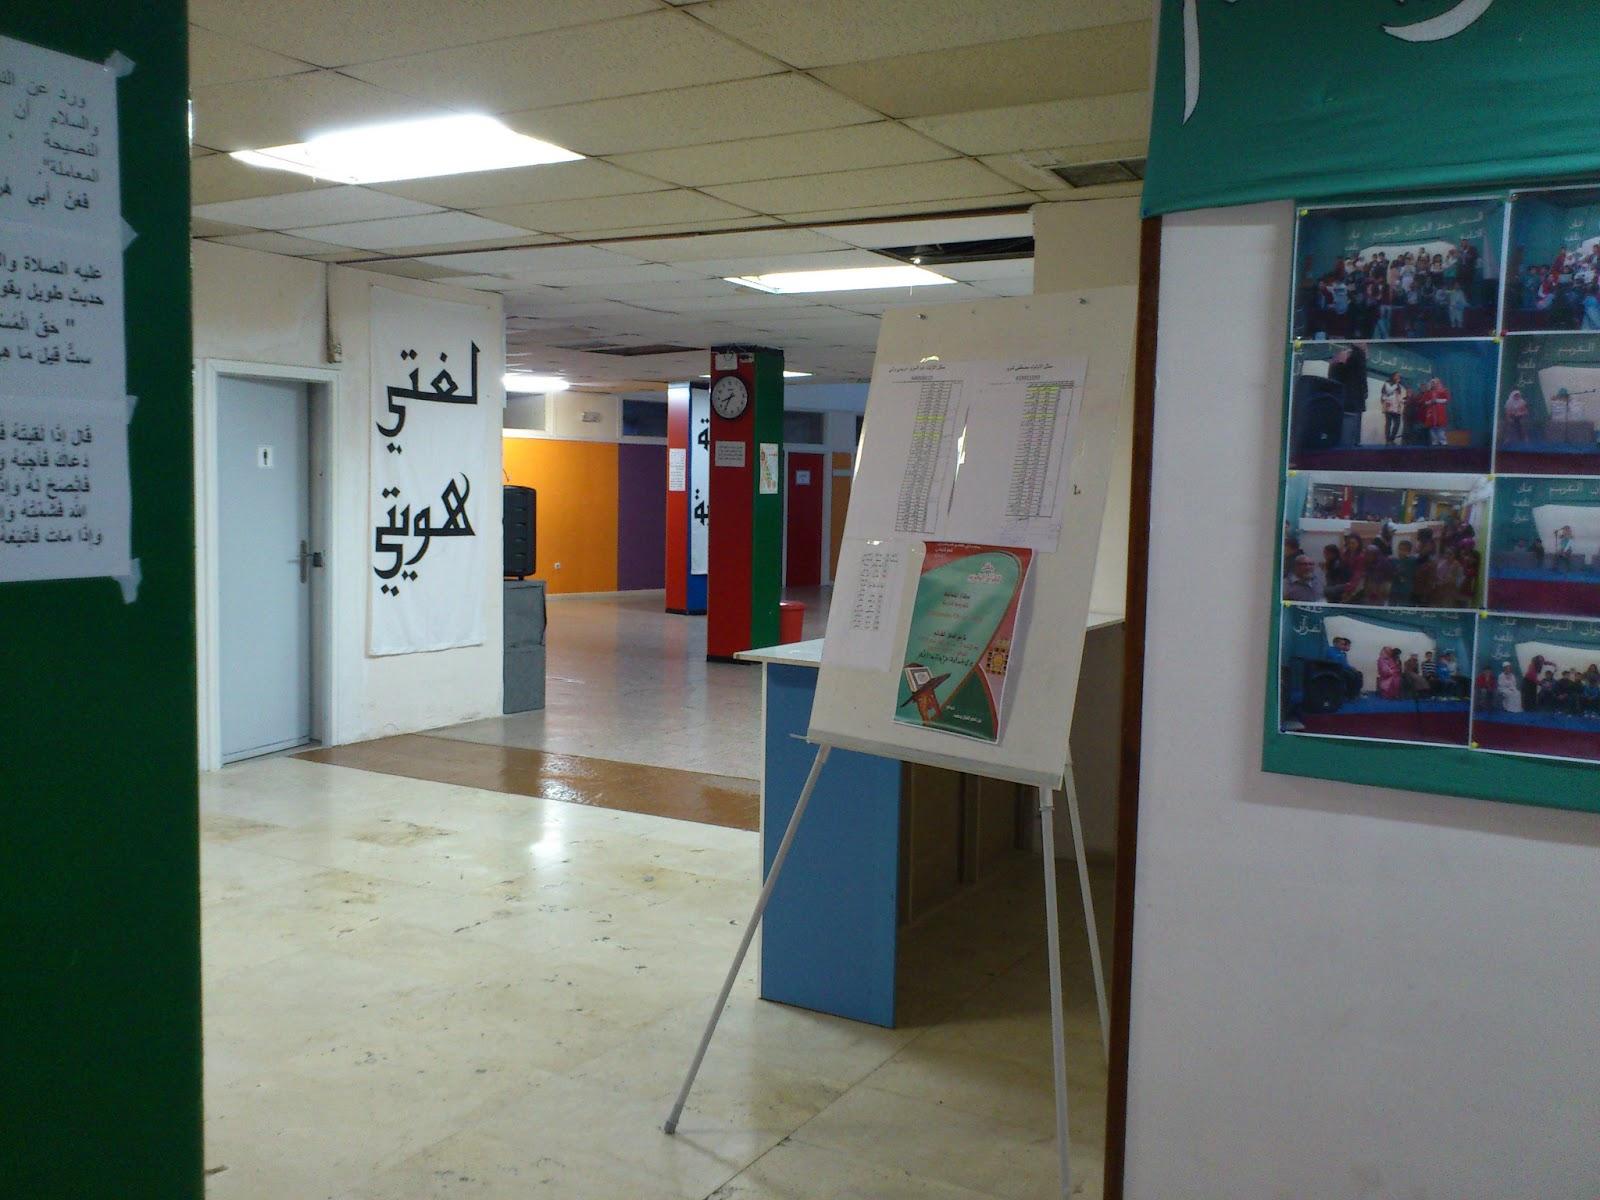 La escuela de Abul Kasim de Zaragoza